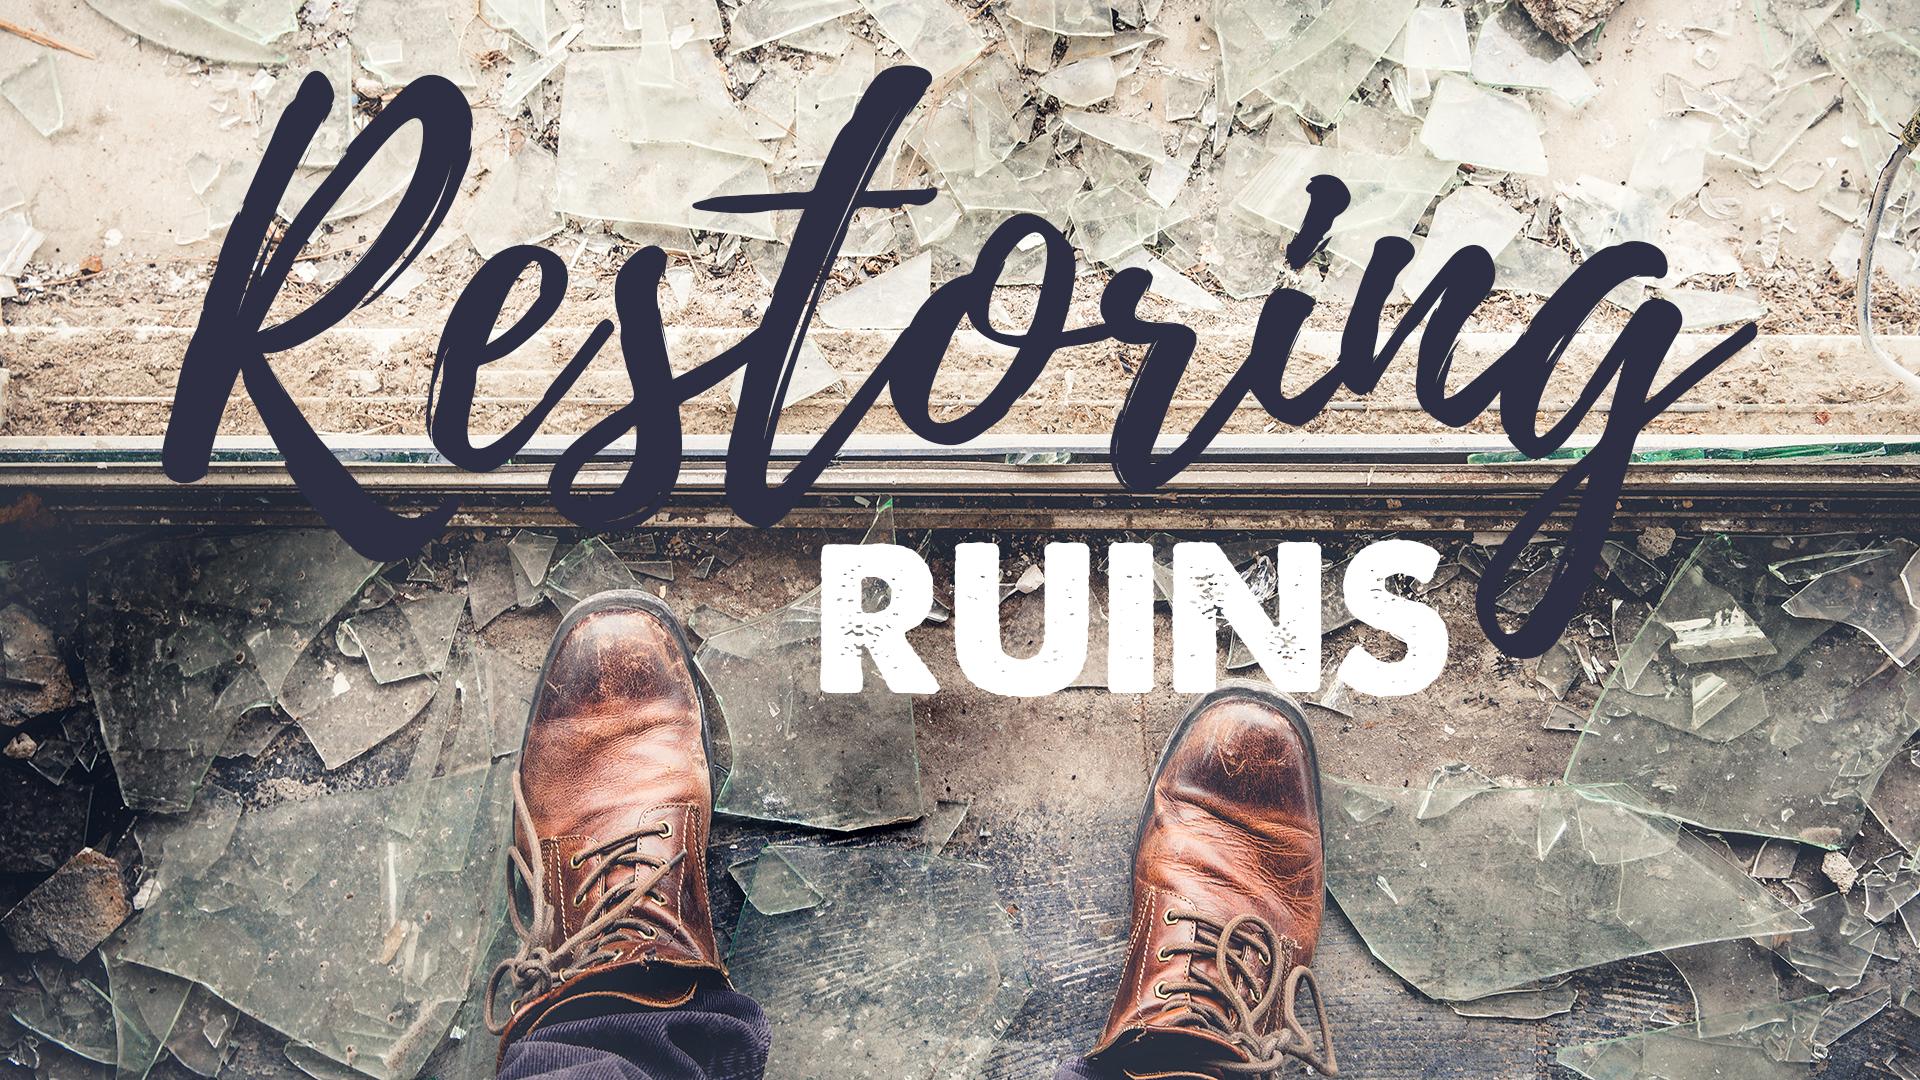 restoring_ruins_1920x1080